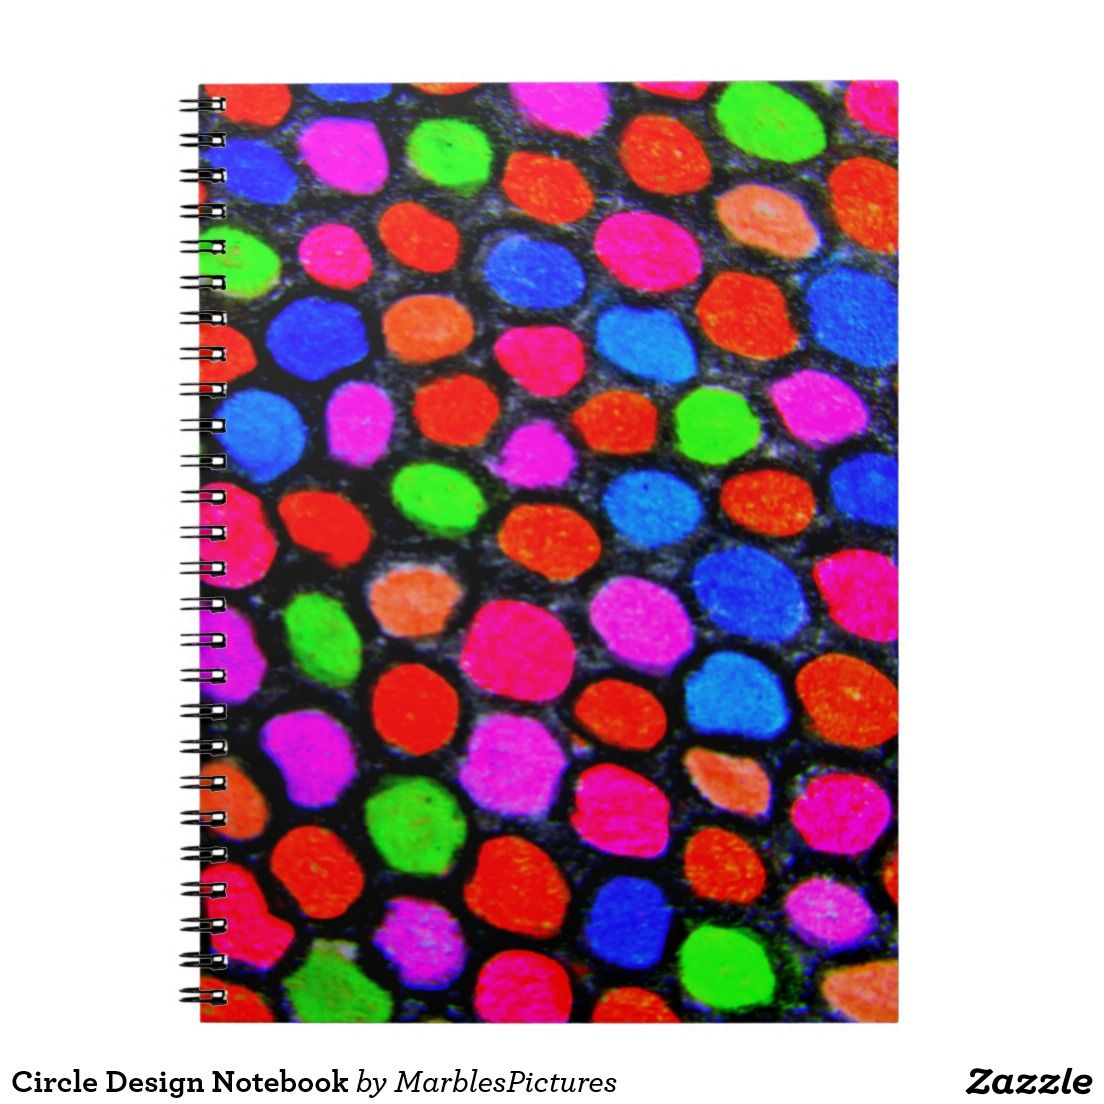 Circle design notebook notebook journal circles